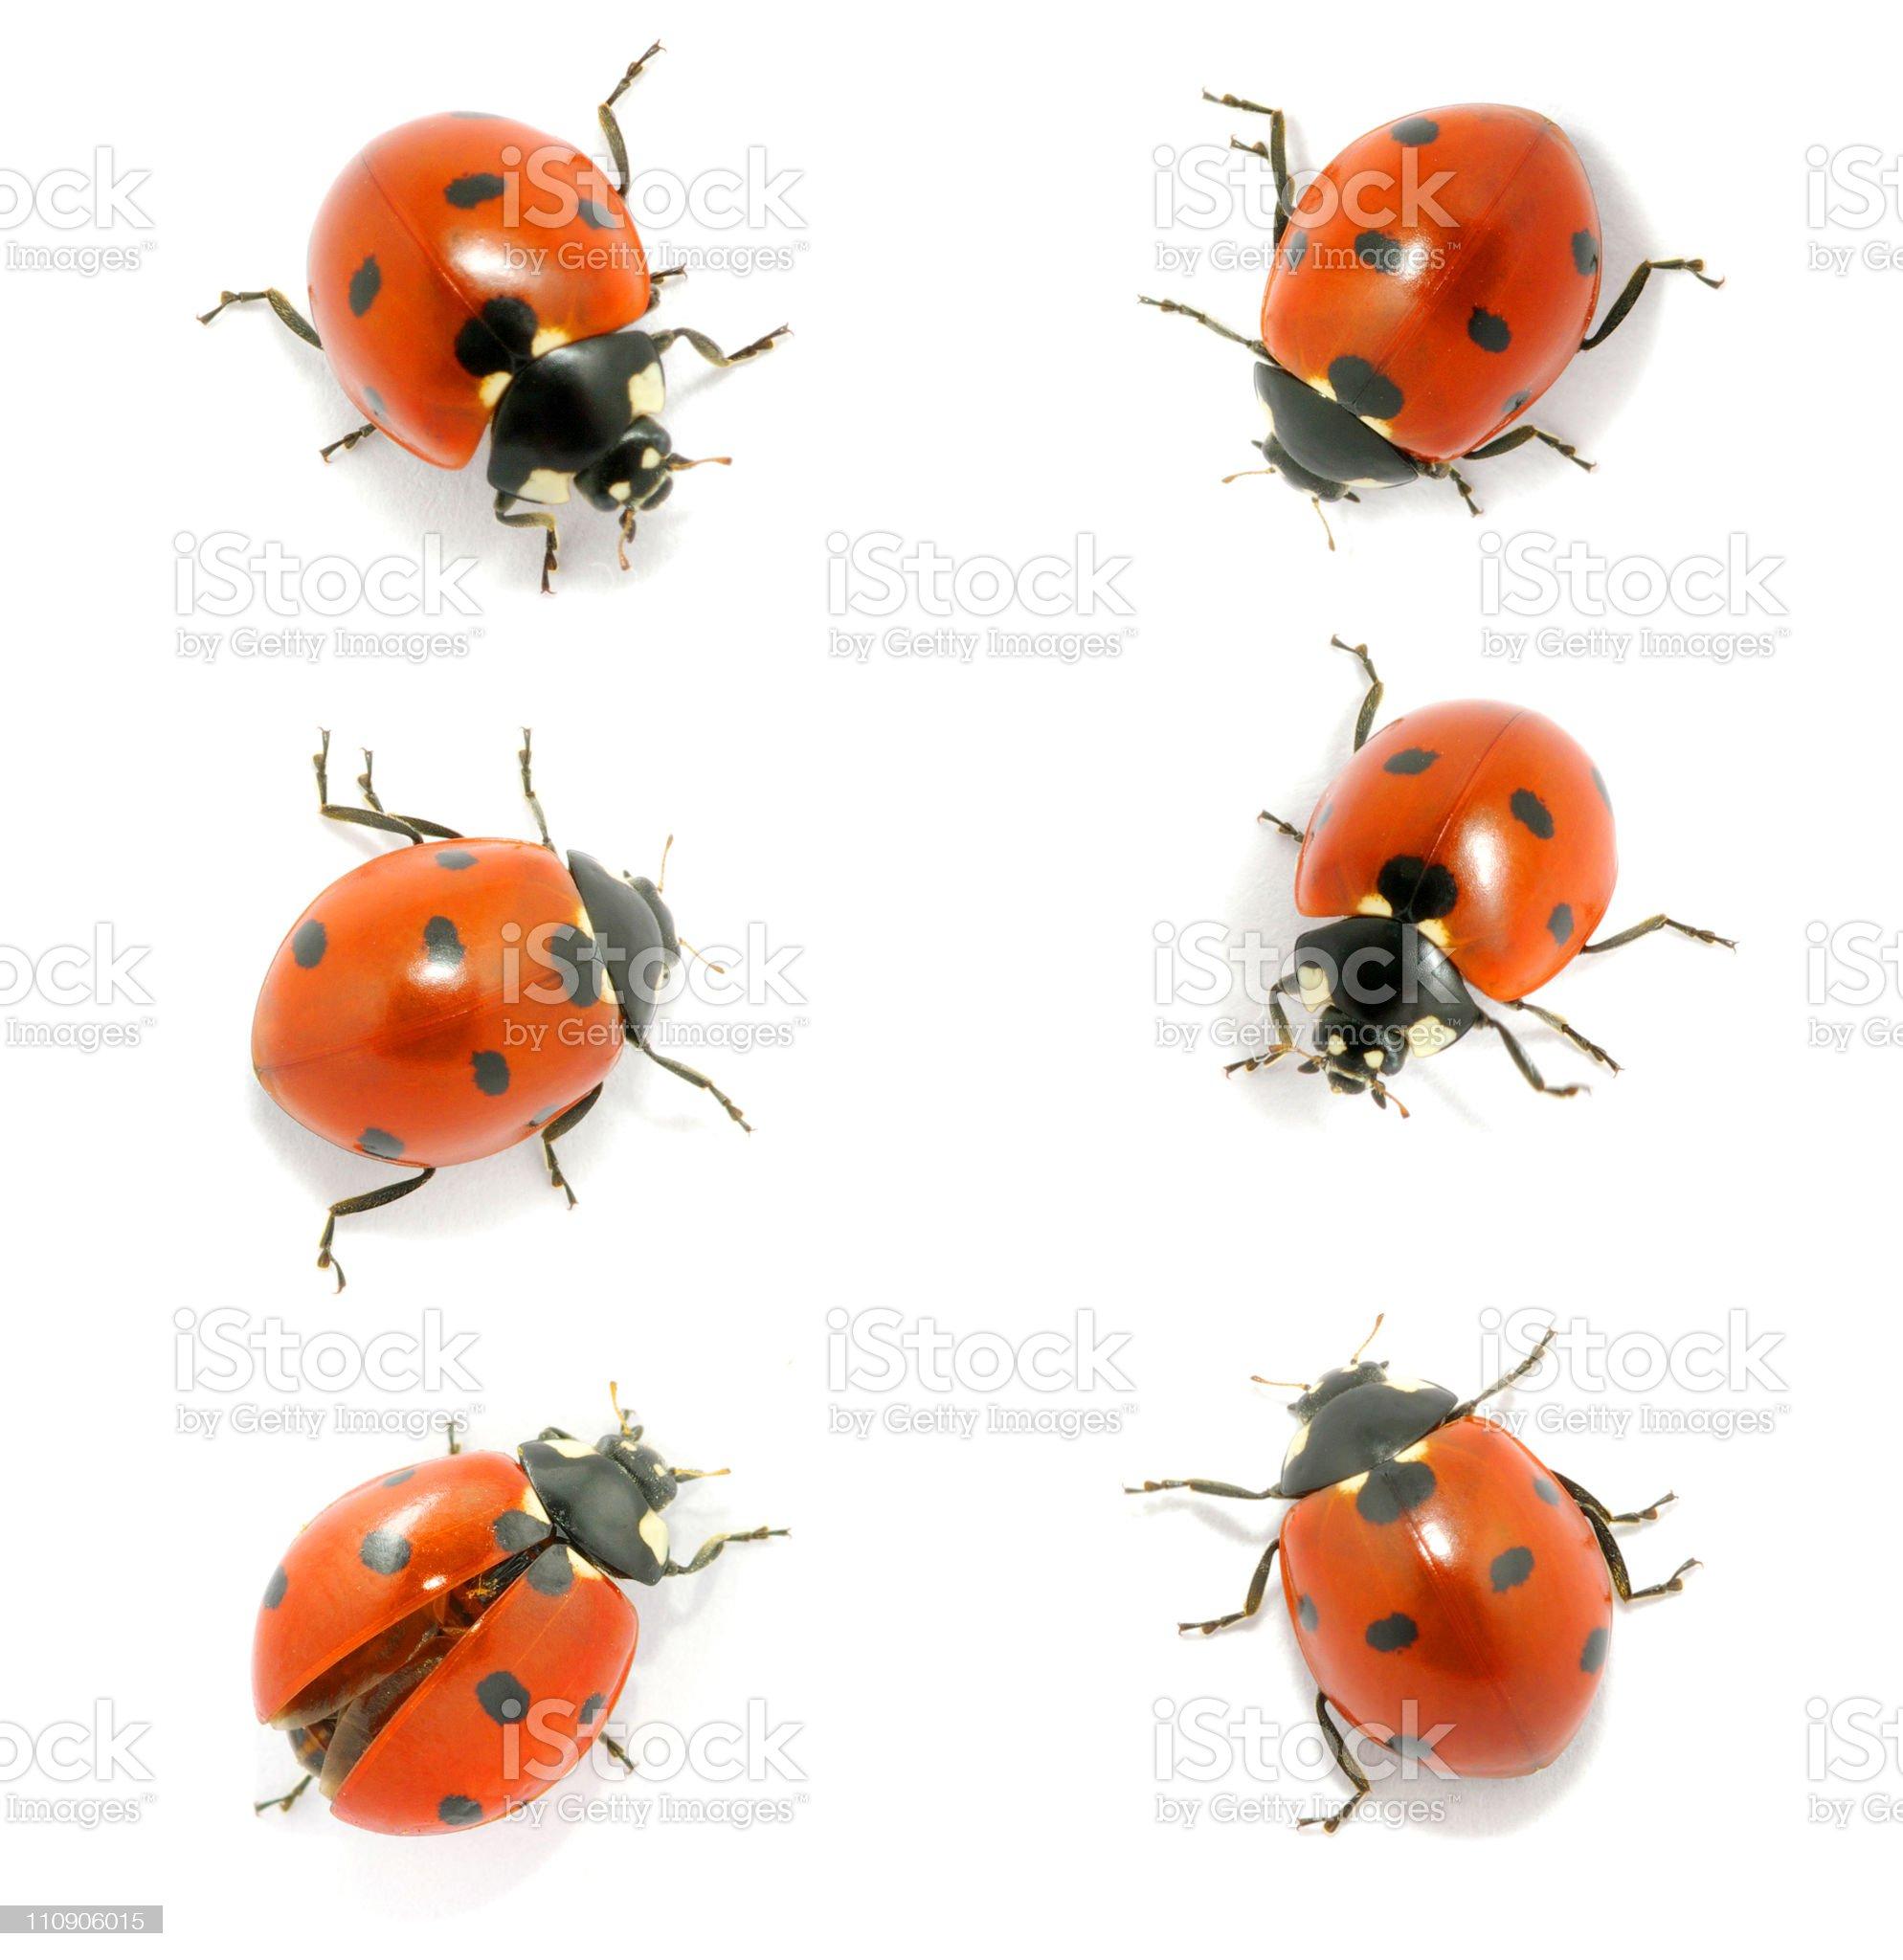 Six red ladybugs on a white background royalty-free stock photo